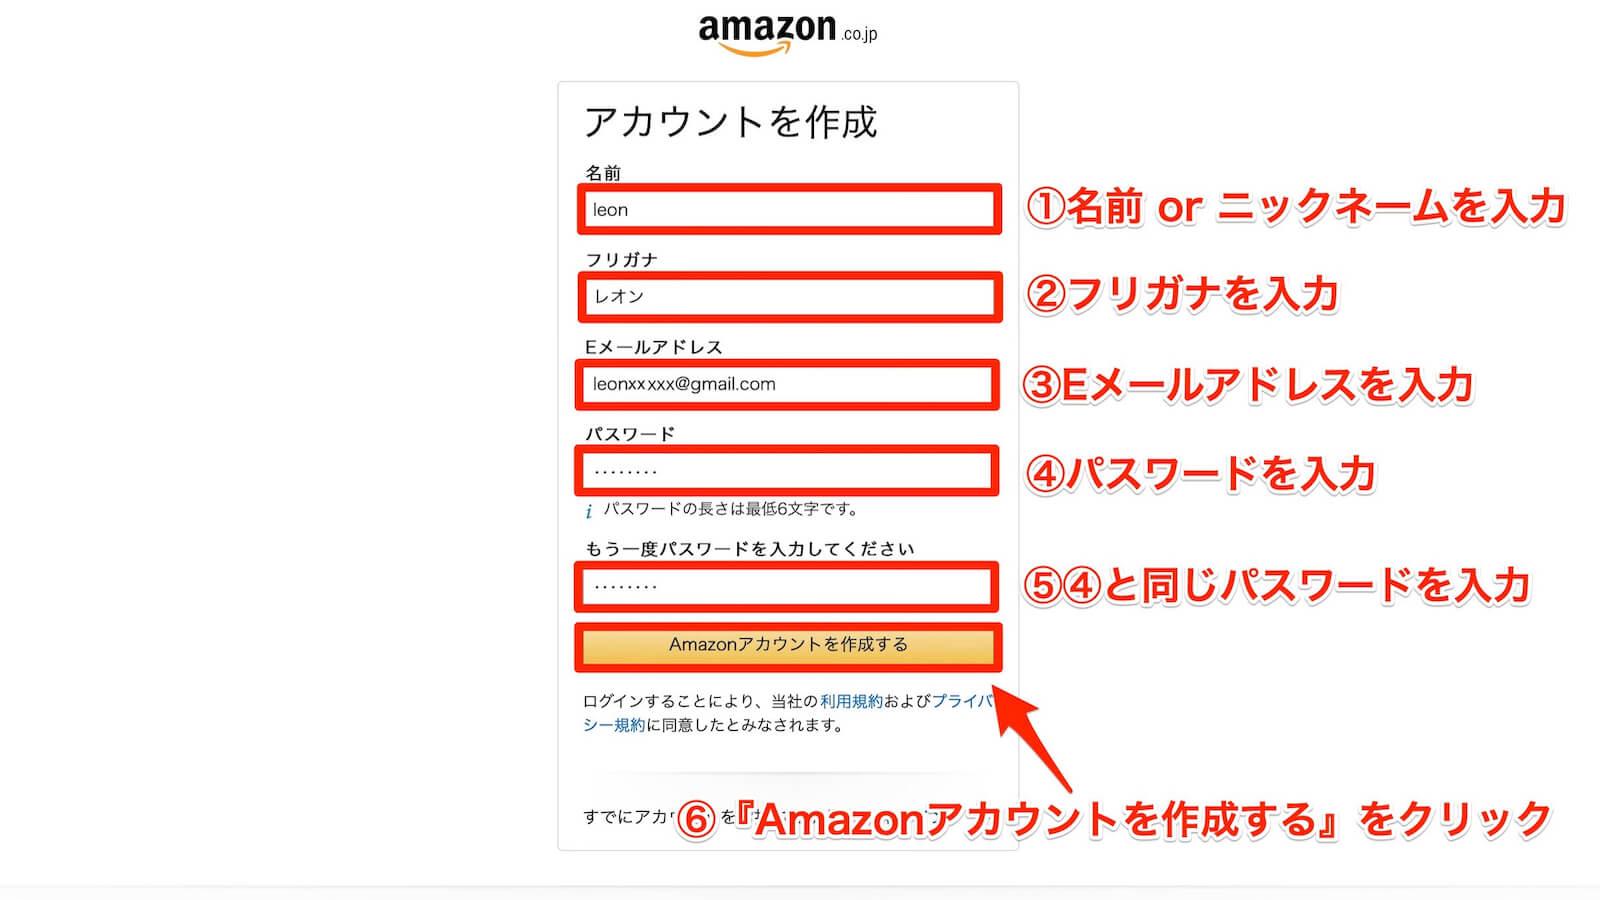 Amazon account creation code input screen capture